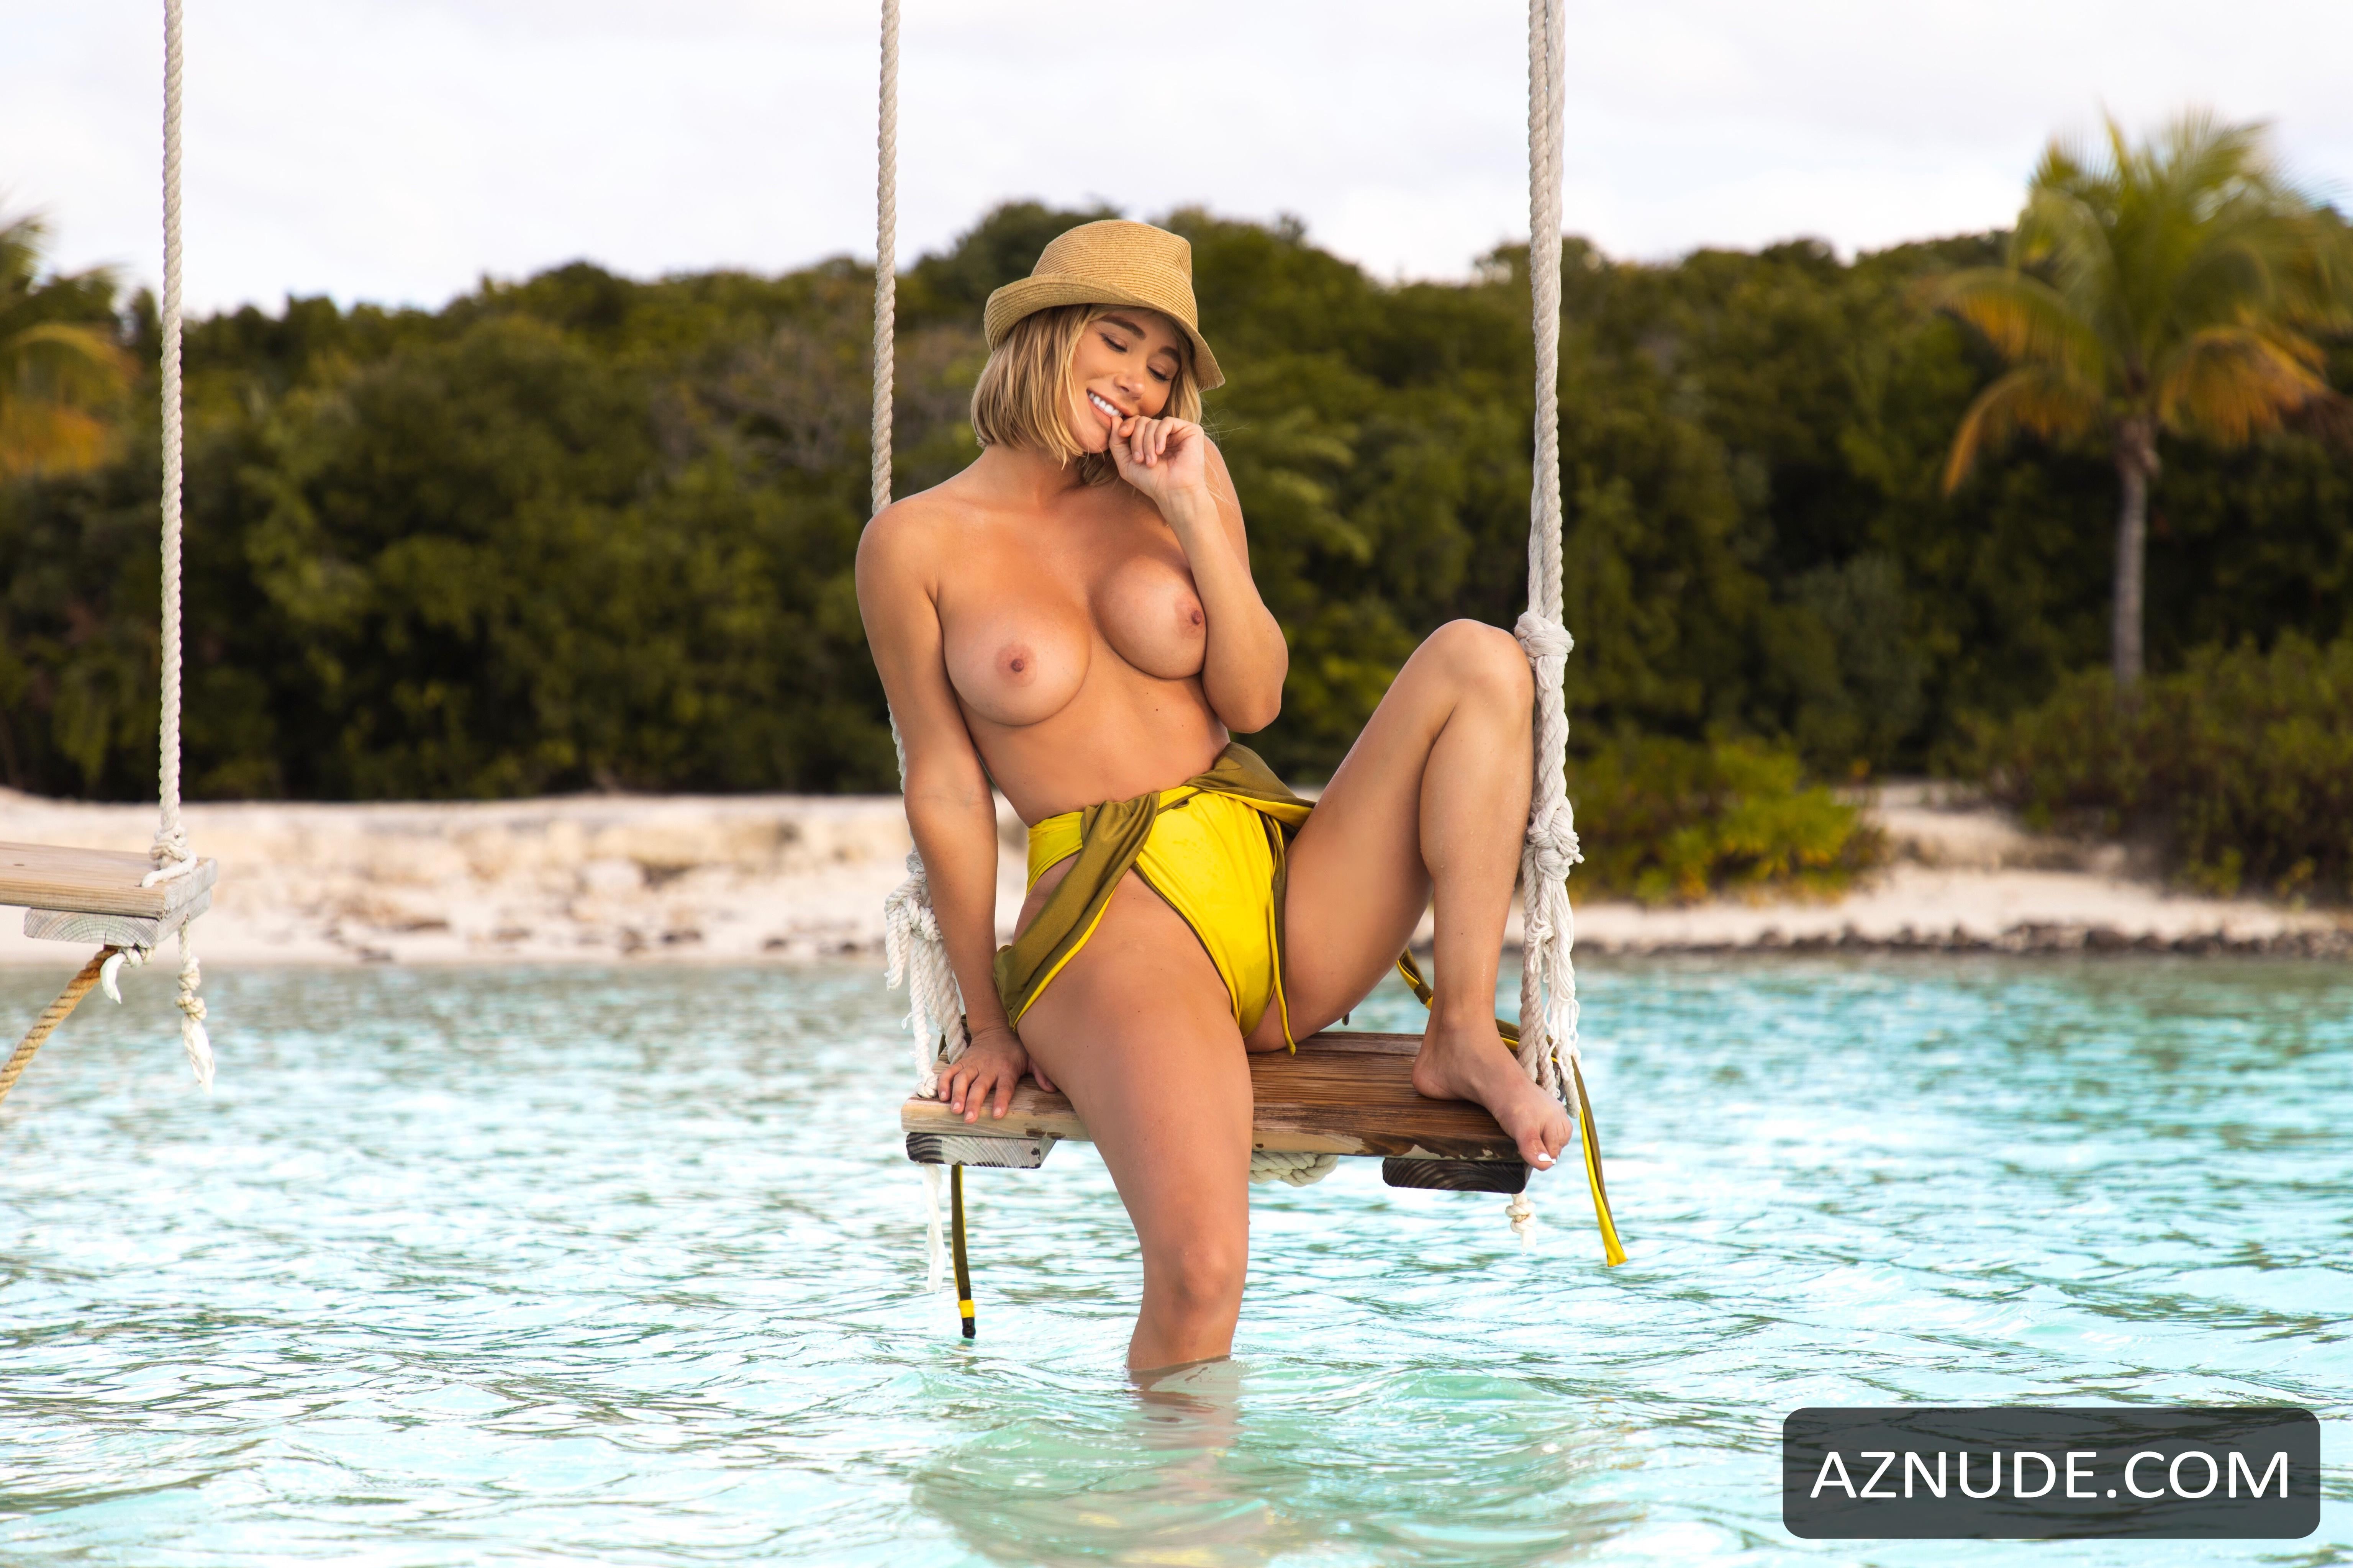 Bristol palin nude pictures-7419